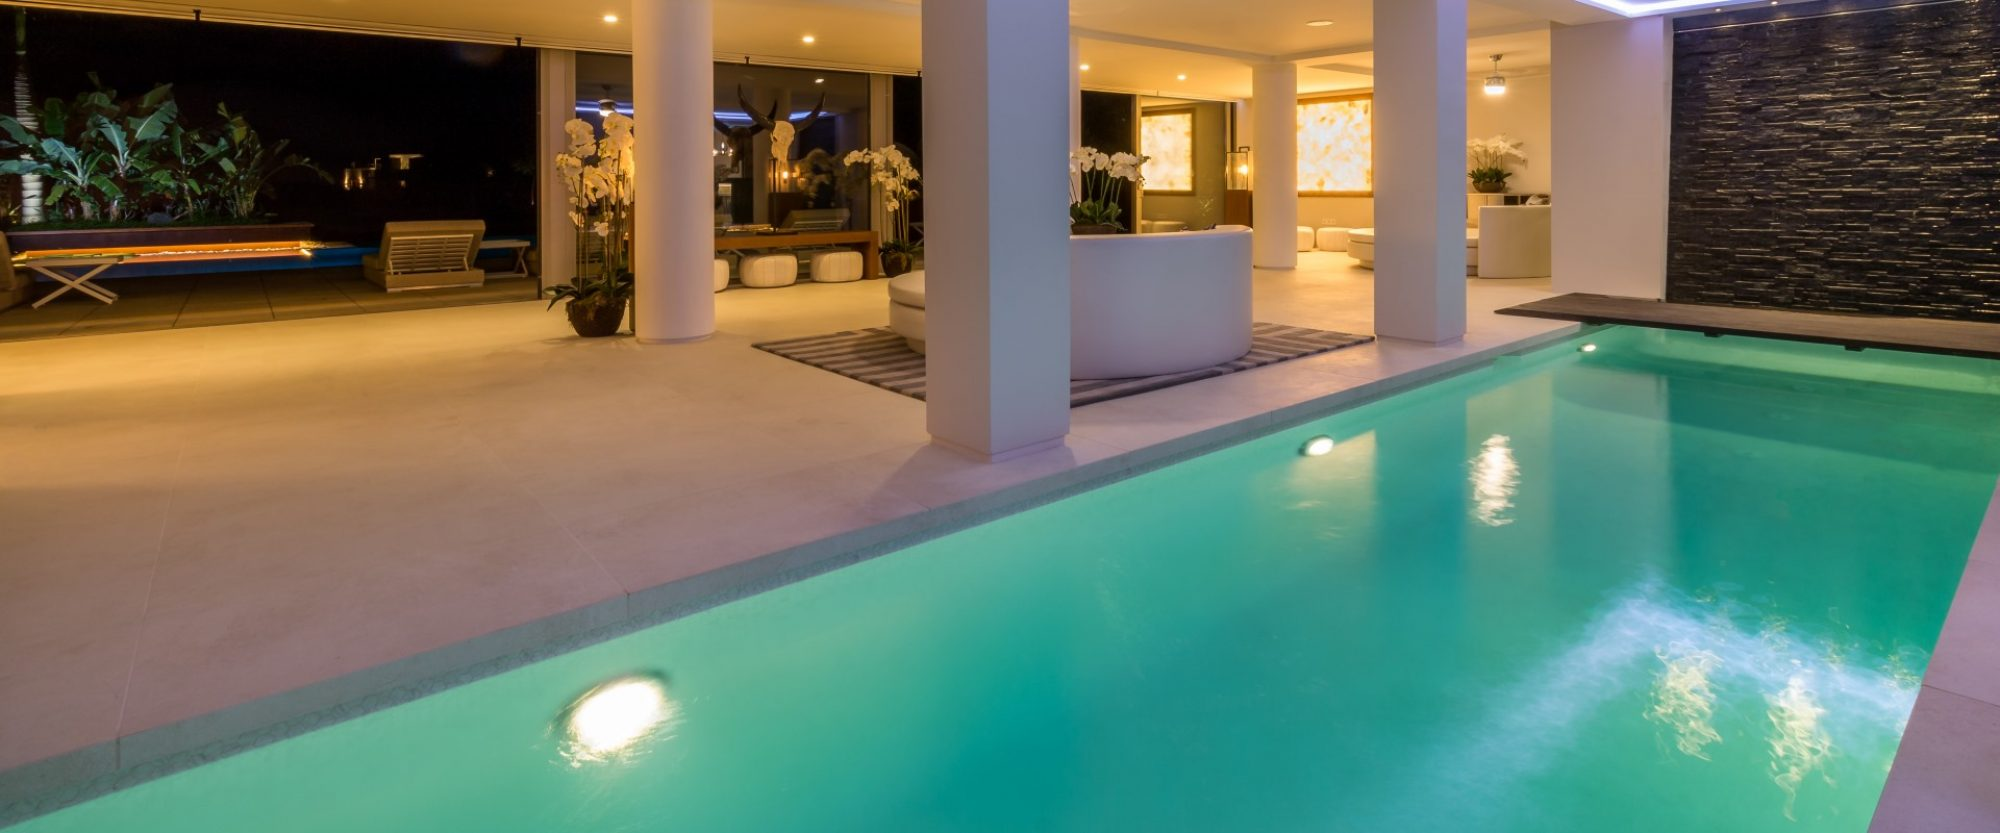 waterfall and spa swimming pool